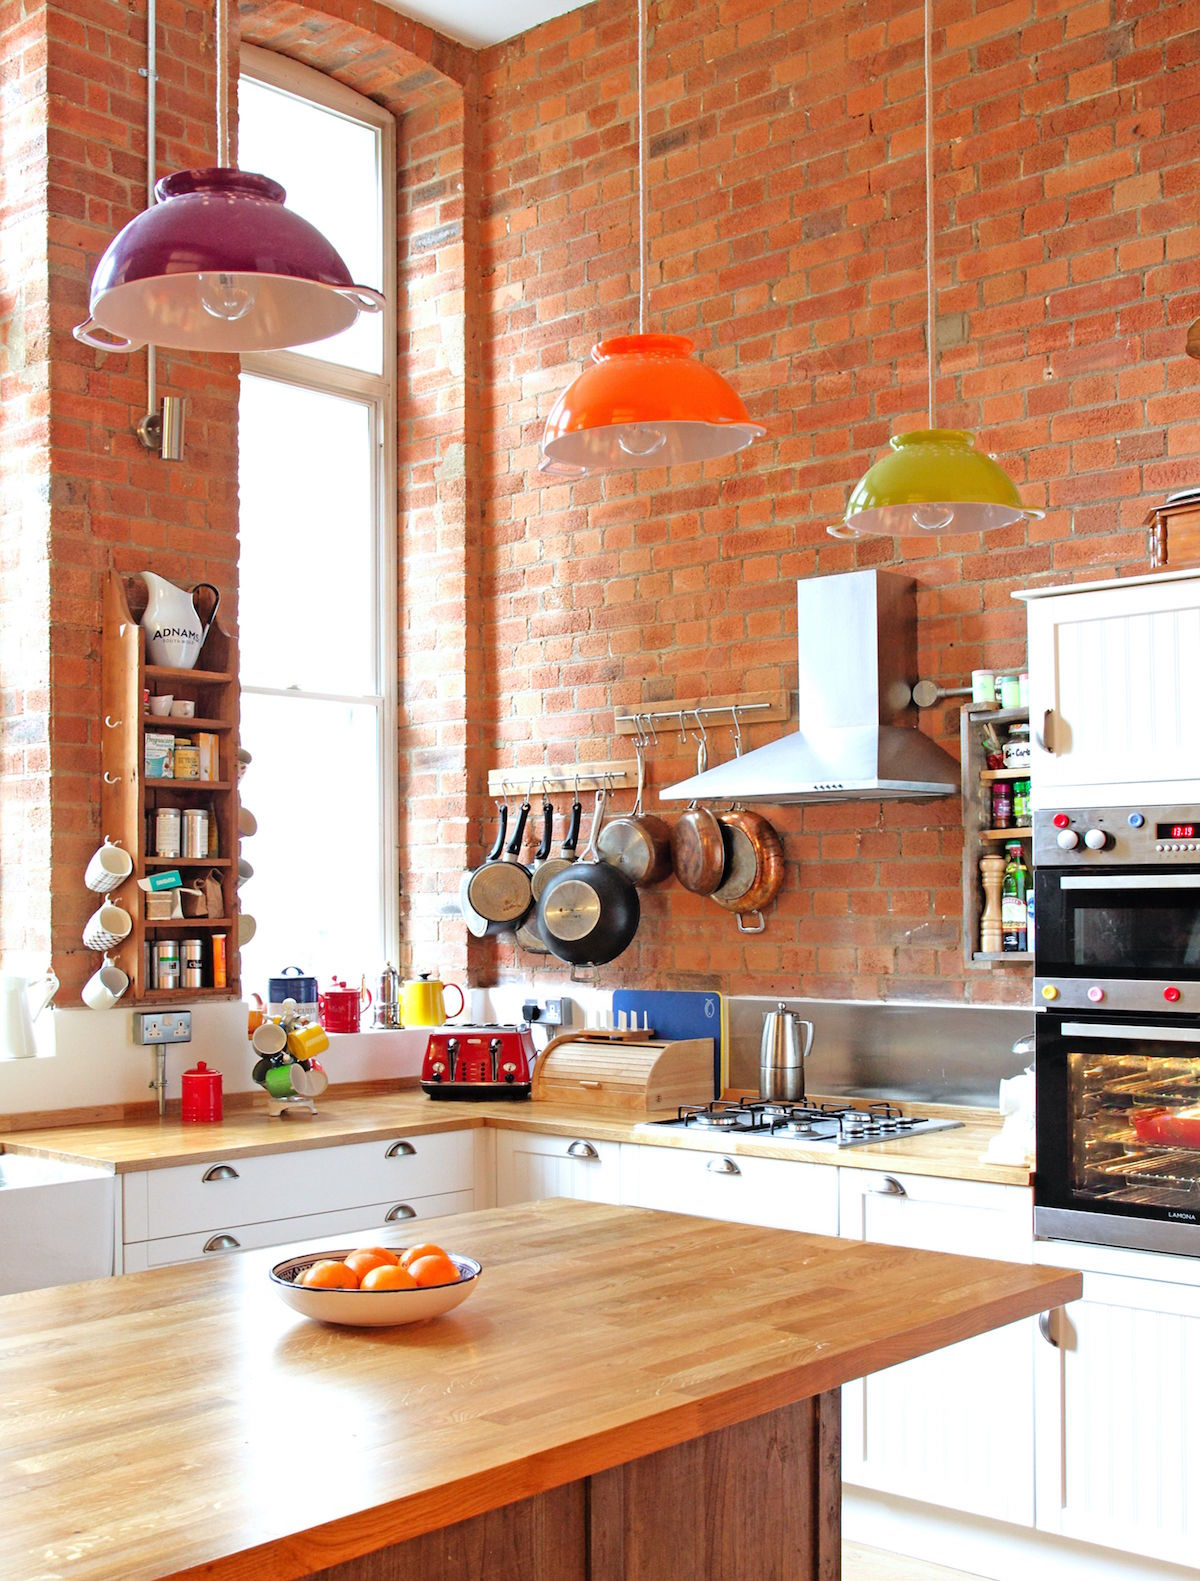 Kuchyň v eklektickém stylu